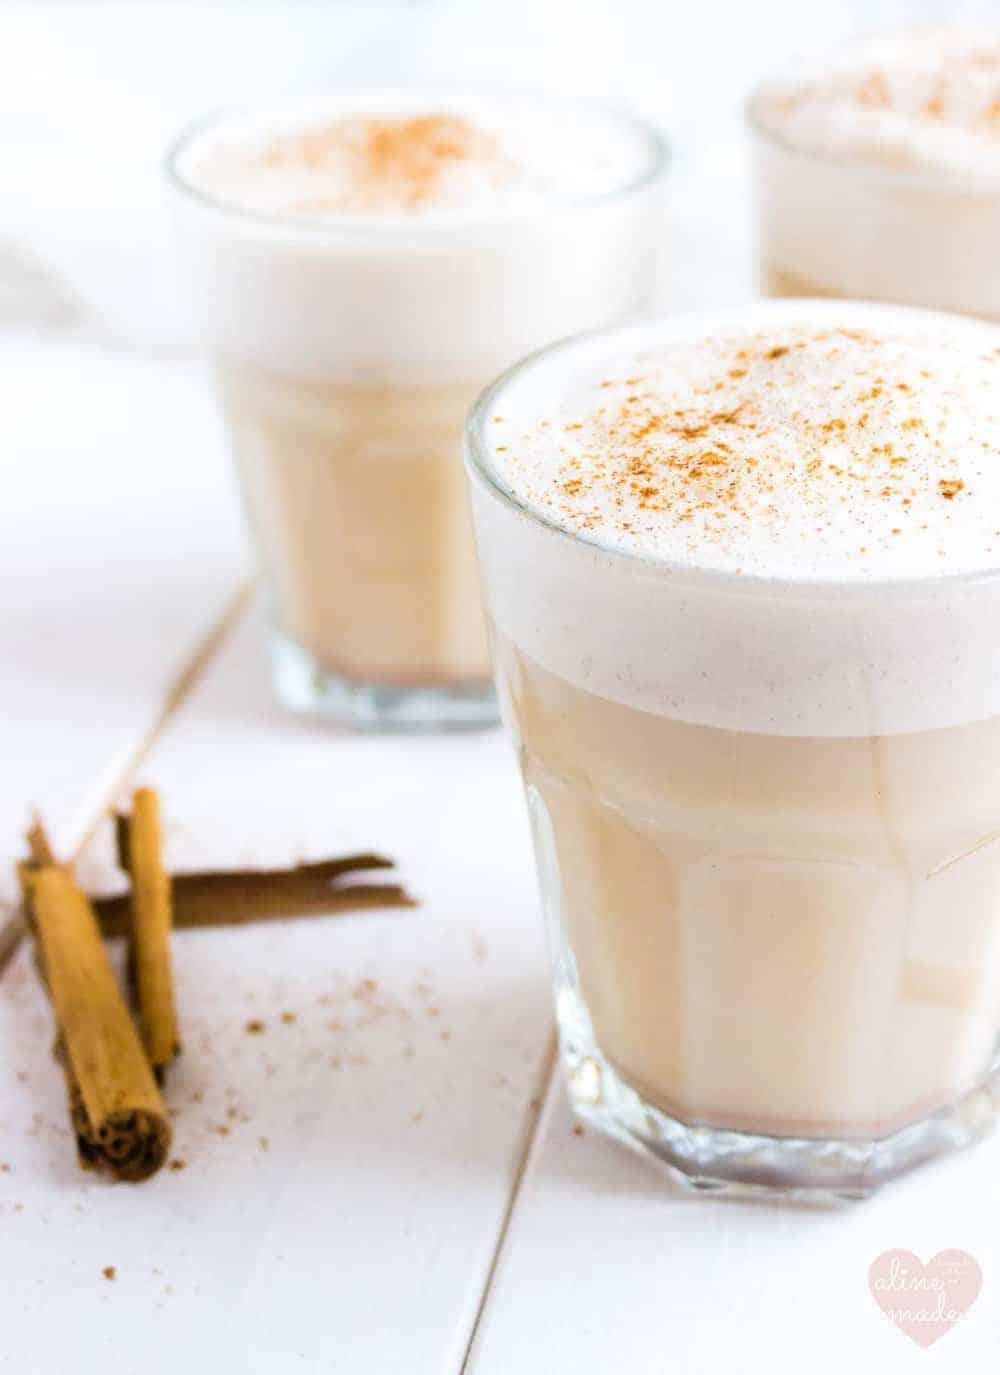 Vegan Horchata Recipe With Almond Milk